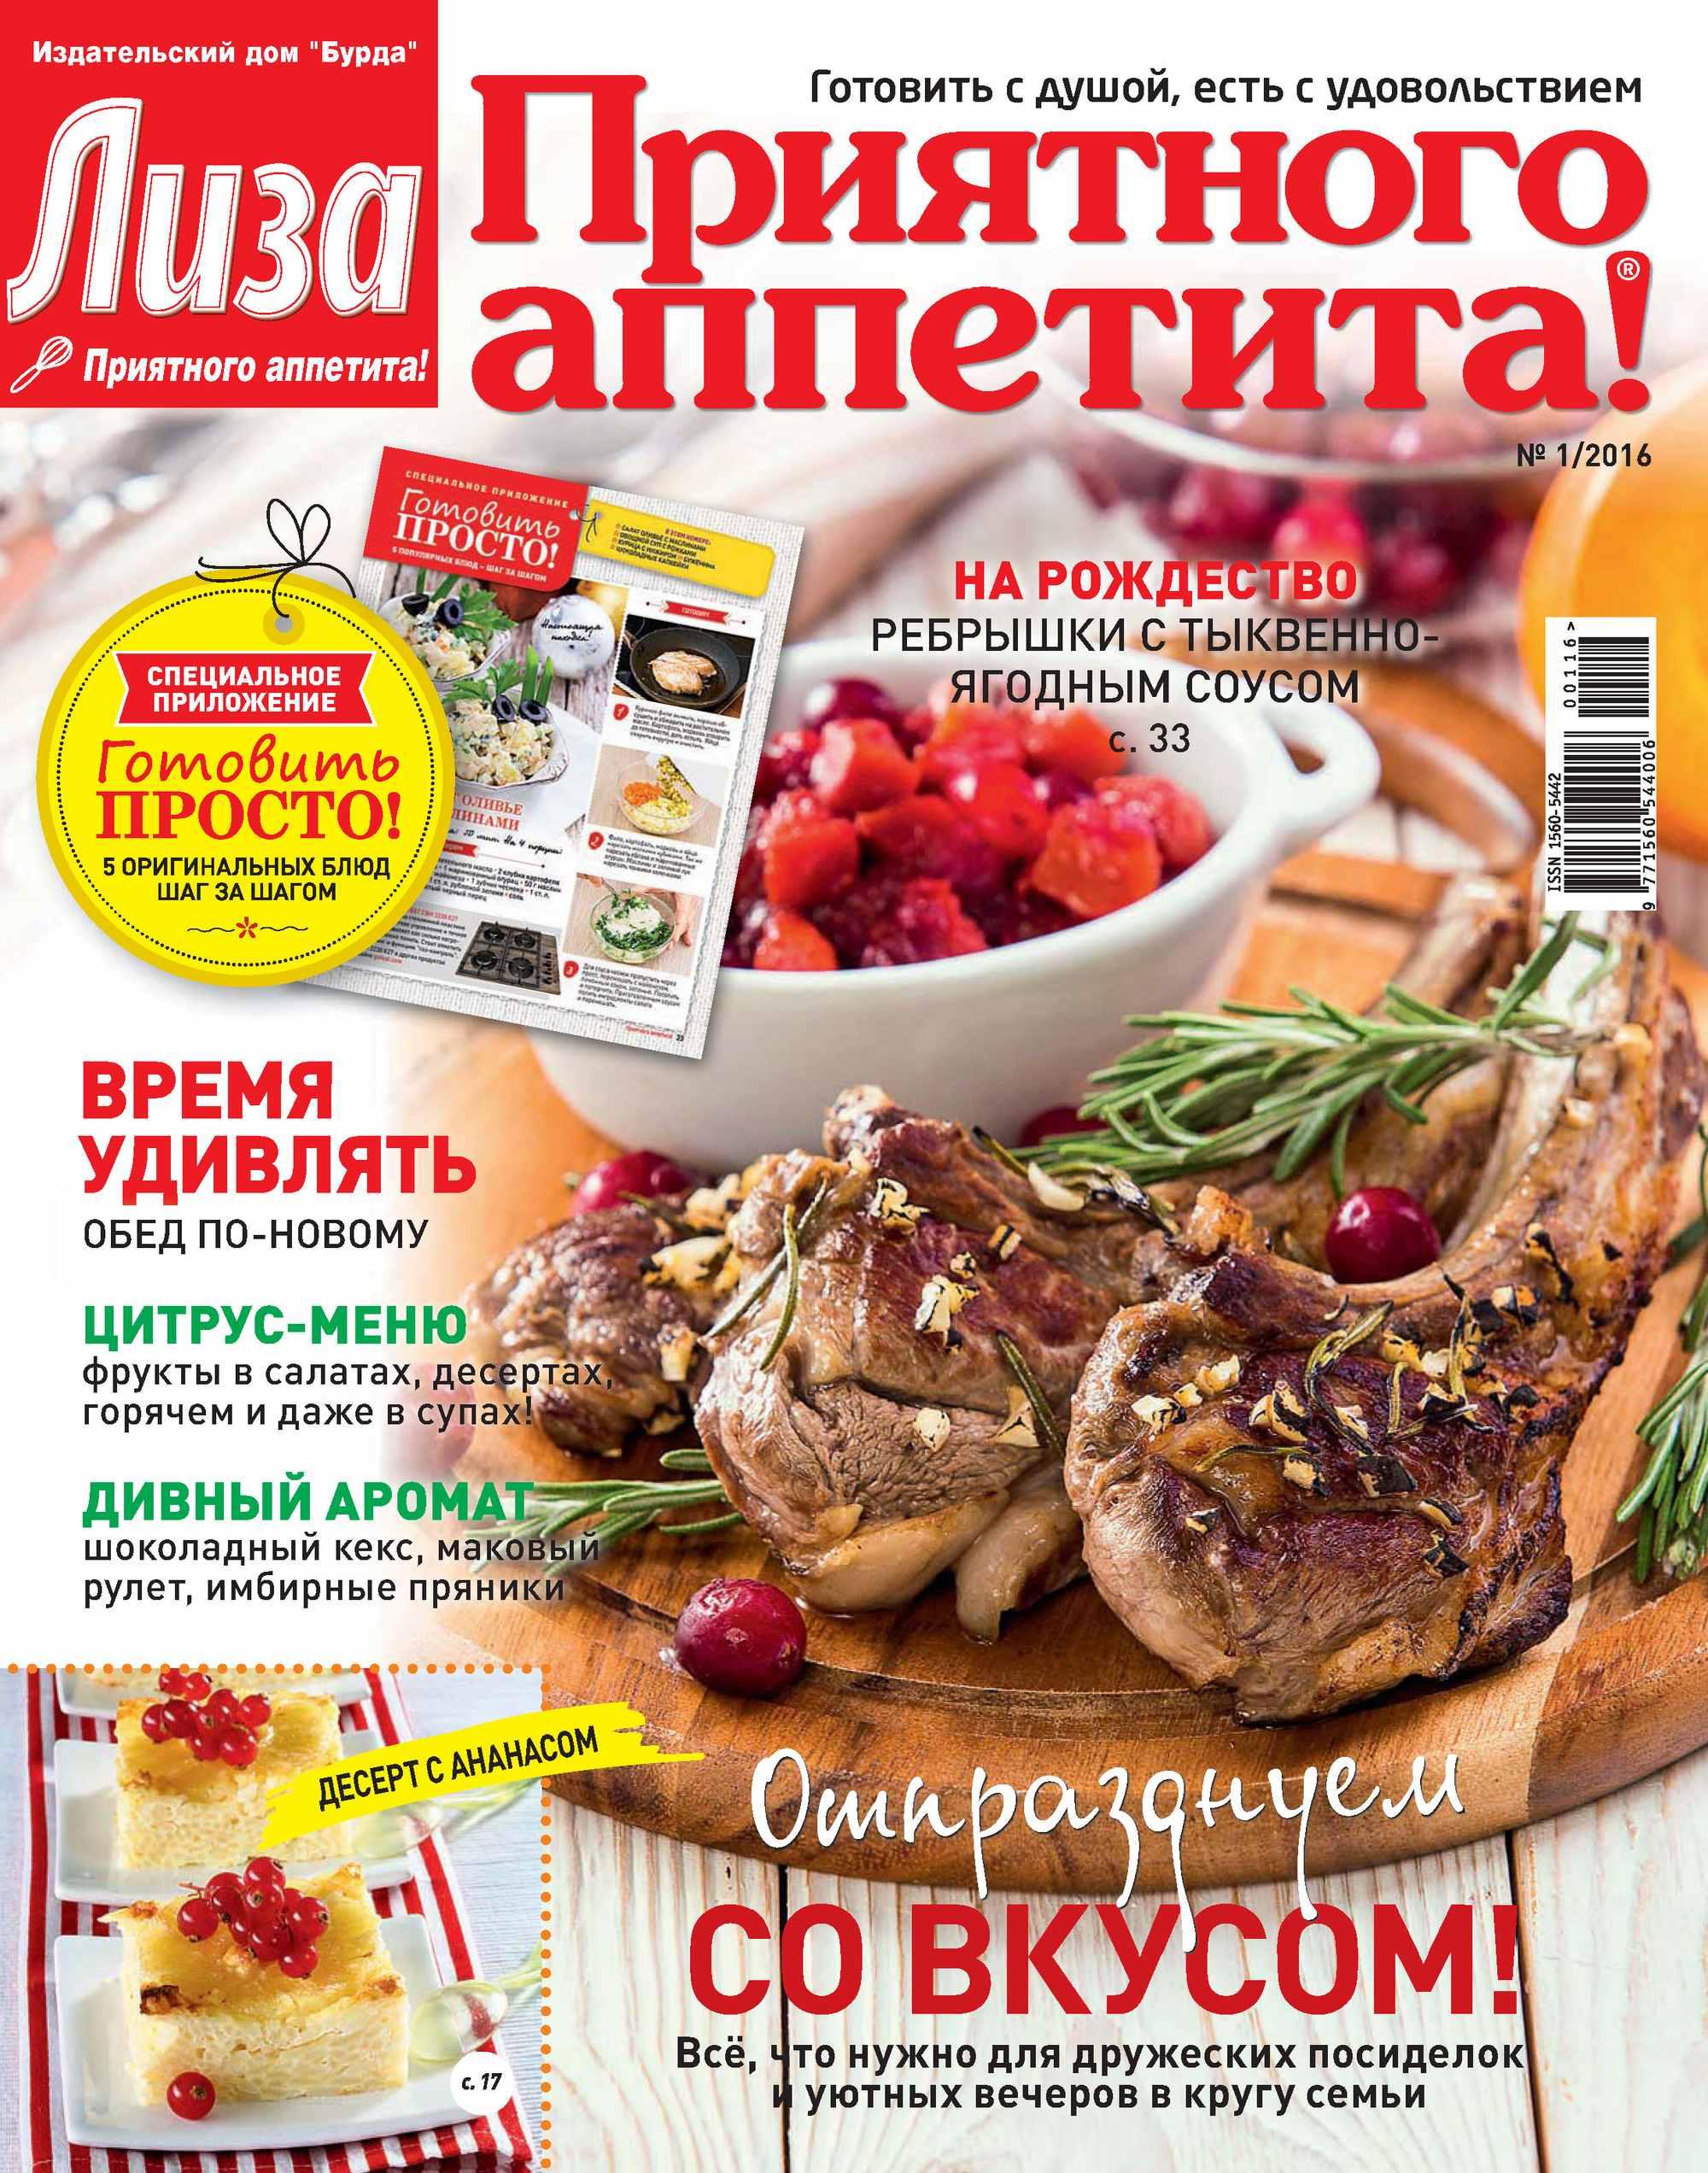 ИД «Бурда» Журнал «Лиза. Приятного аппетита» №01/2016 ид бурда журнал лиза приятного аппетита 04 2015